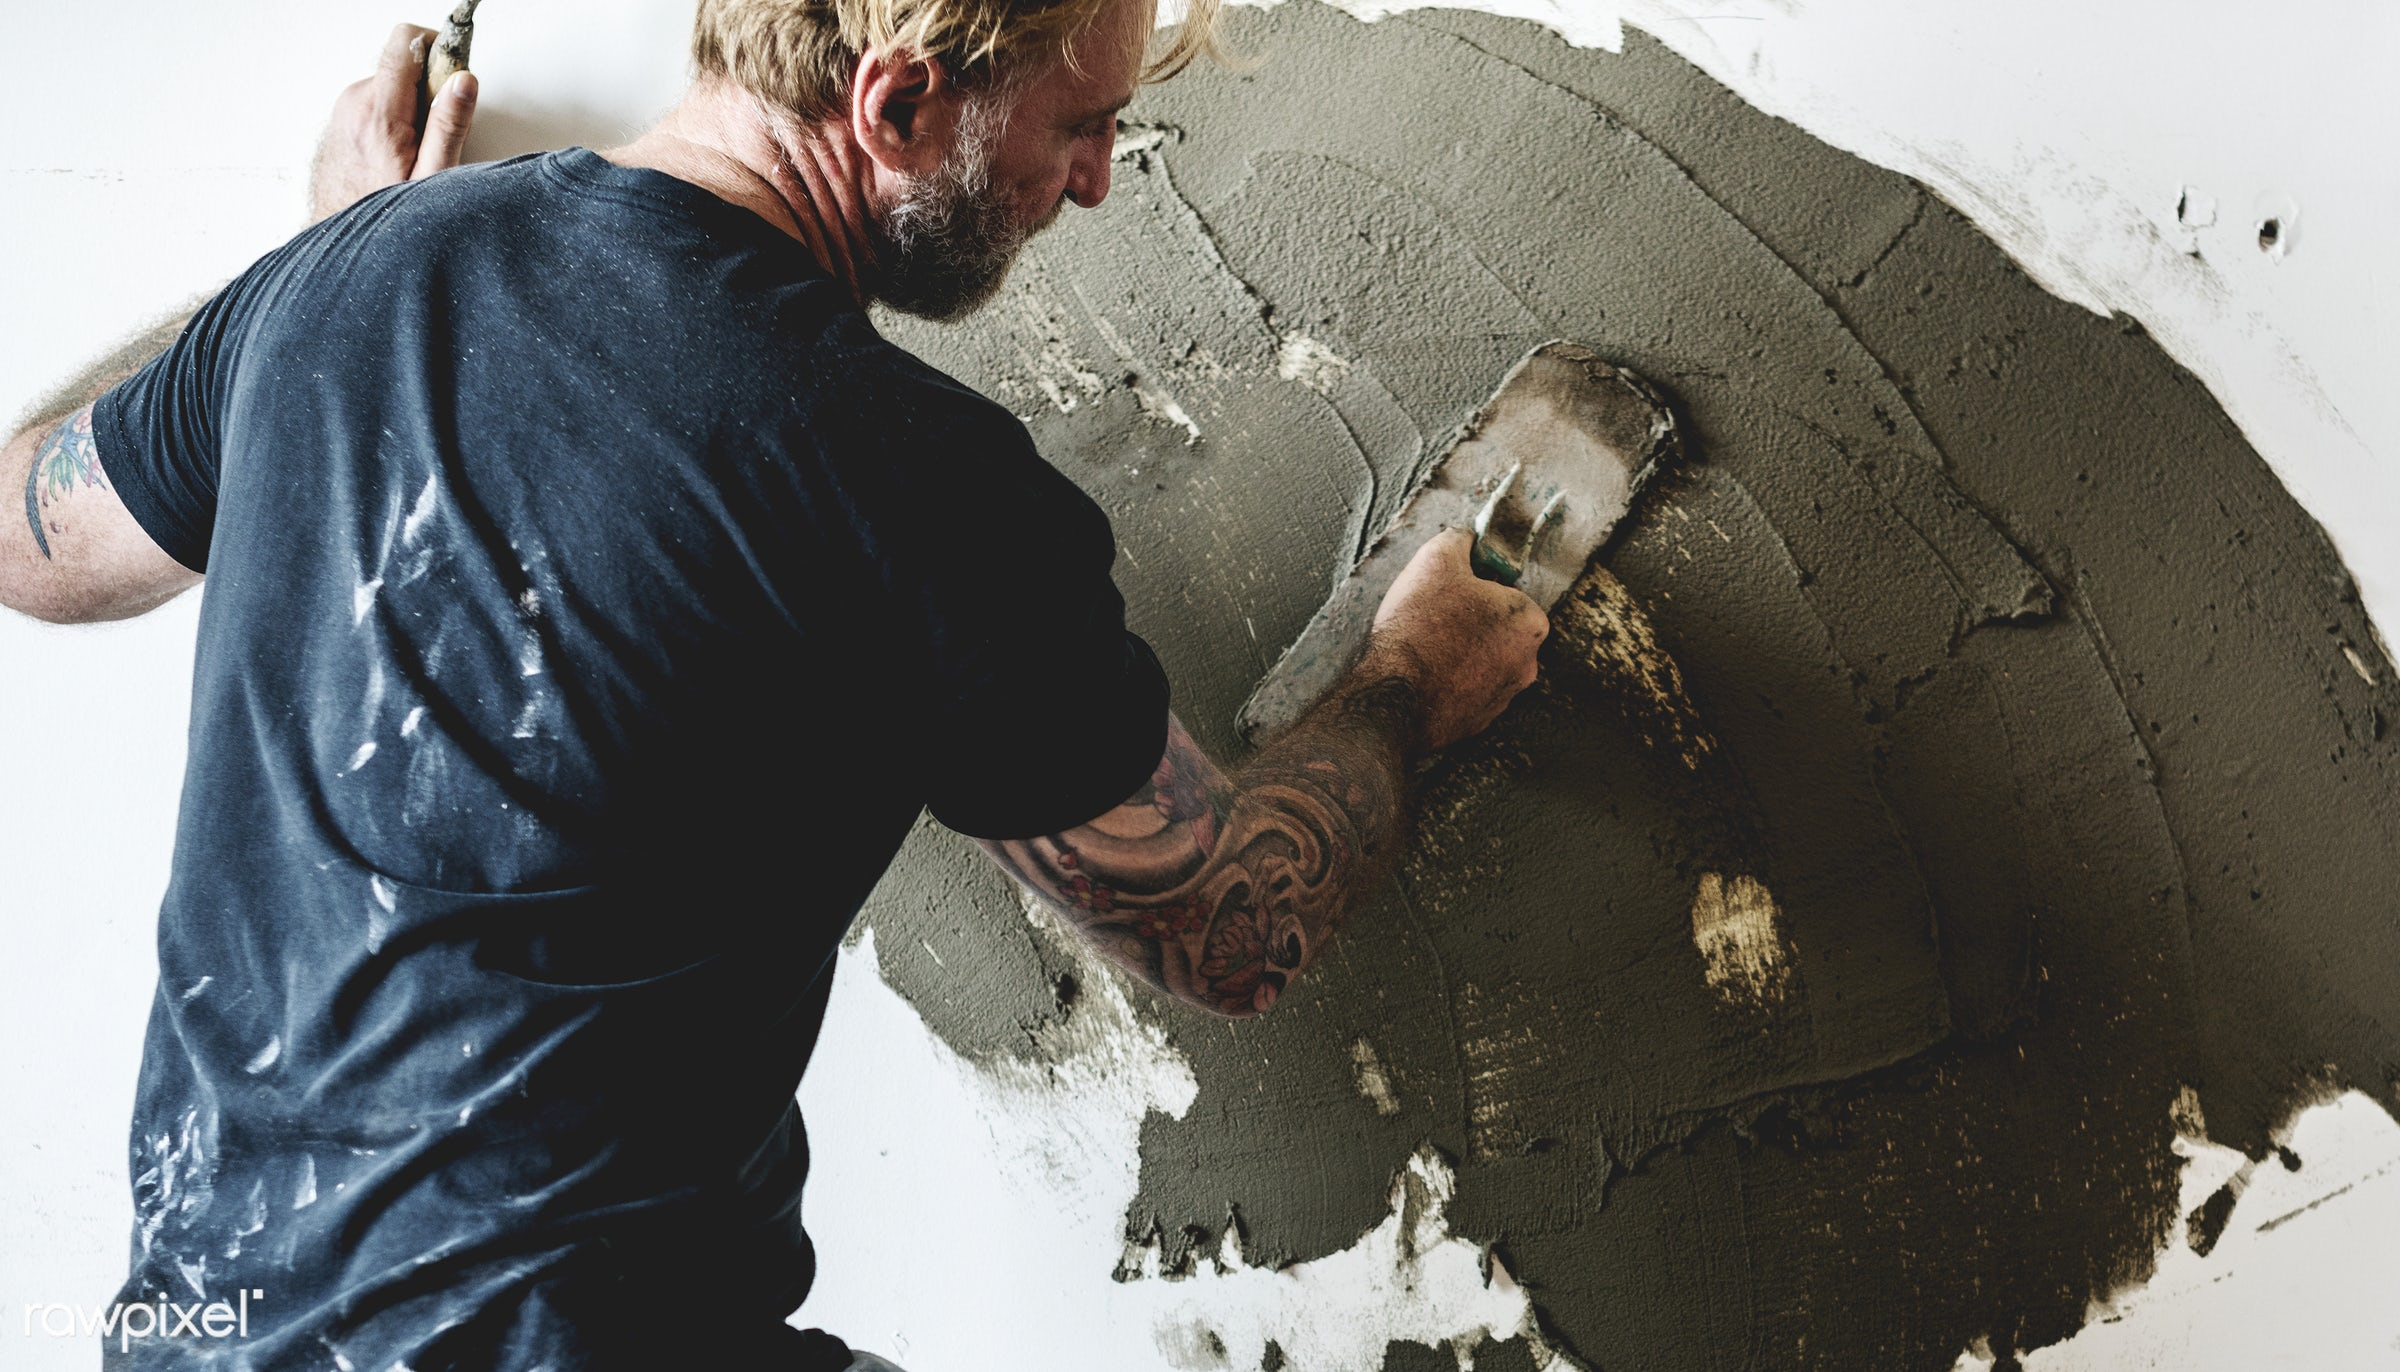 Construction worker - indoor, tool, equipment, grout, plaster, mortar, worker, repair, cement, renovation, construction, man...